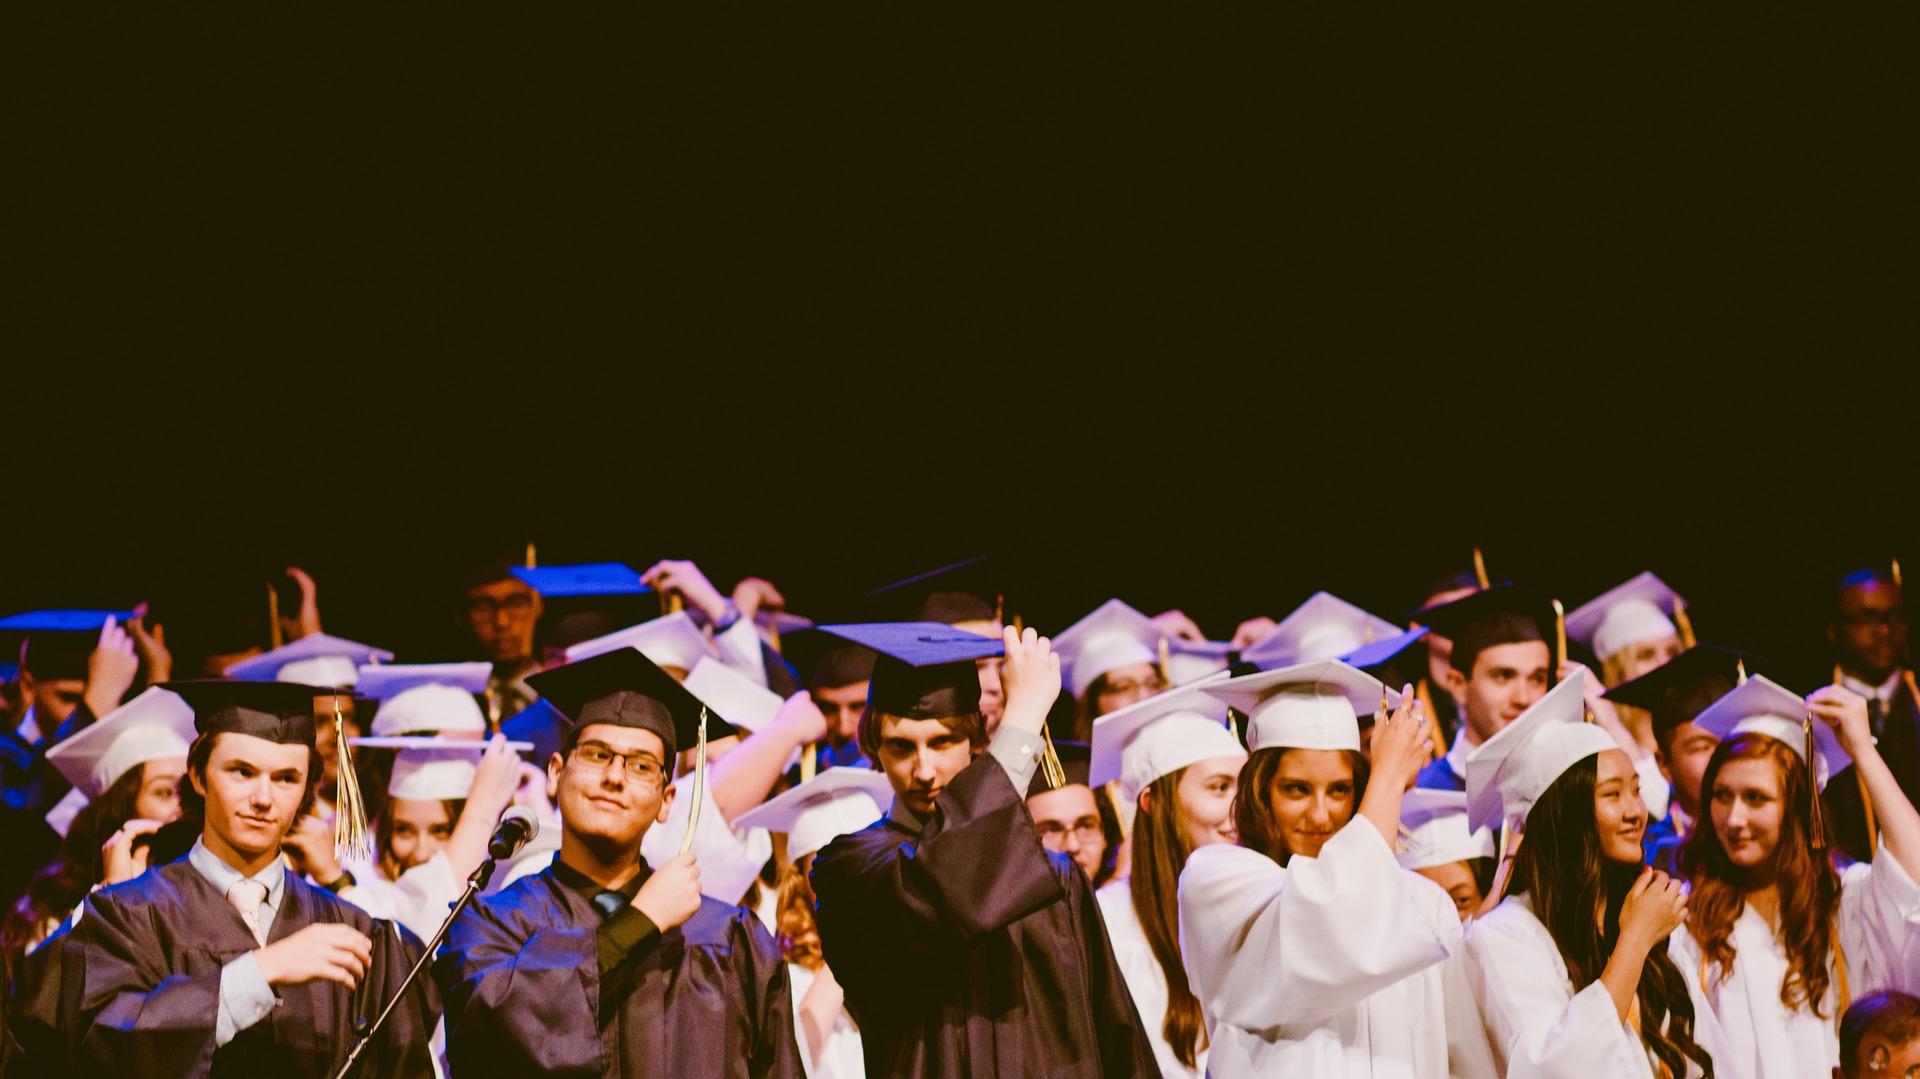 Side Gig Ideas For Fresh College Graduates